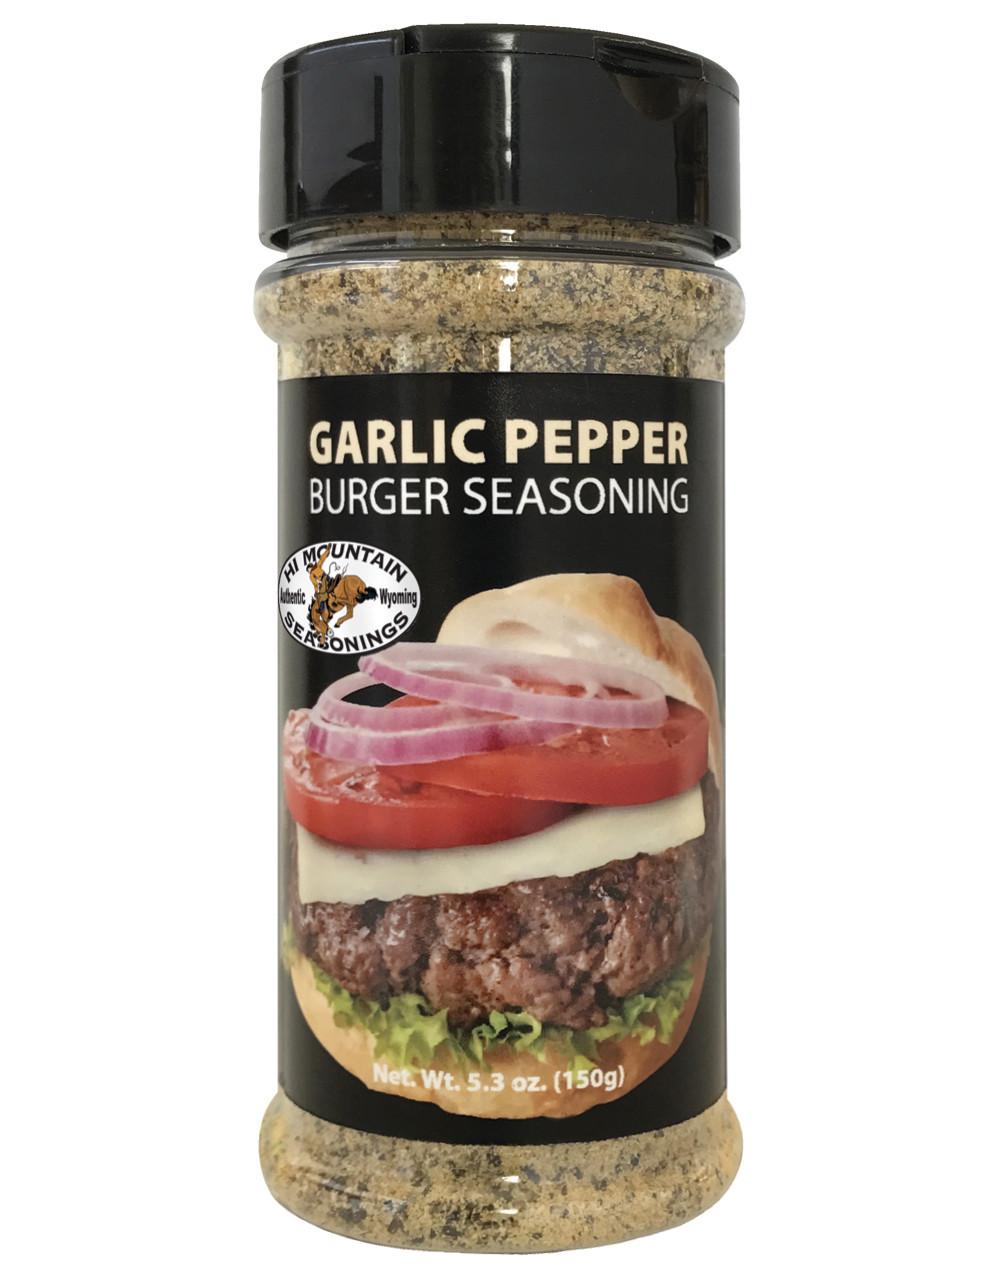 Garlic Pepper Burger Seasoning